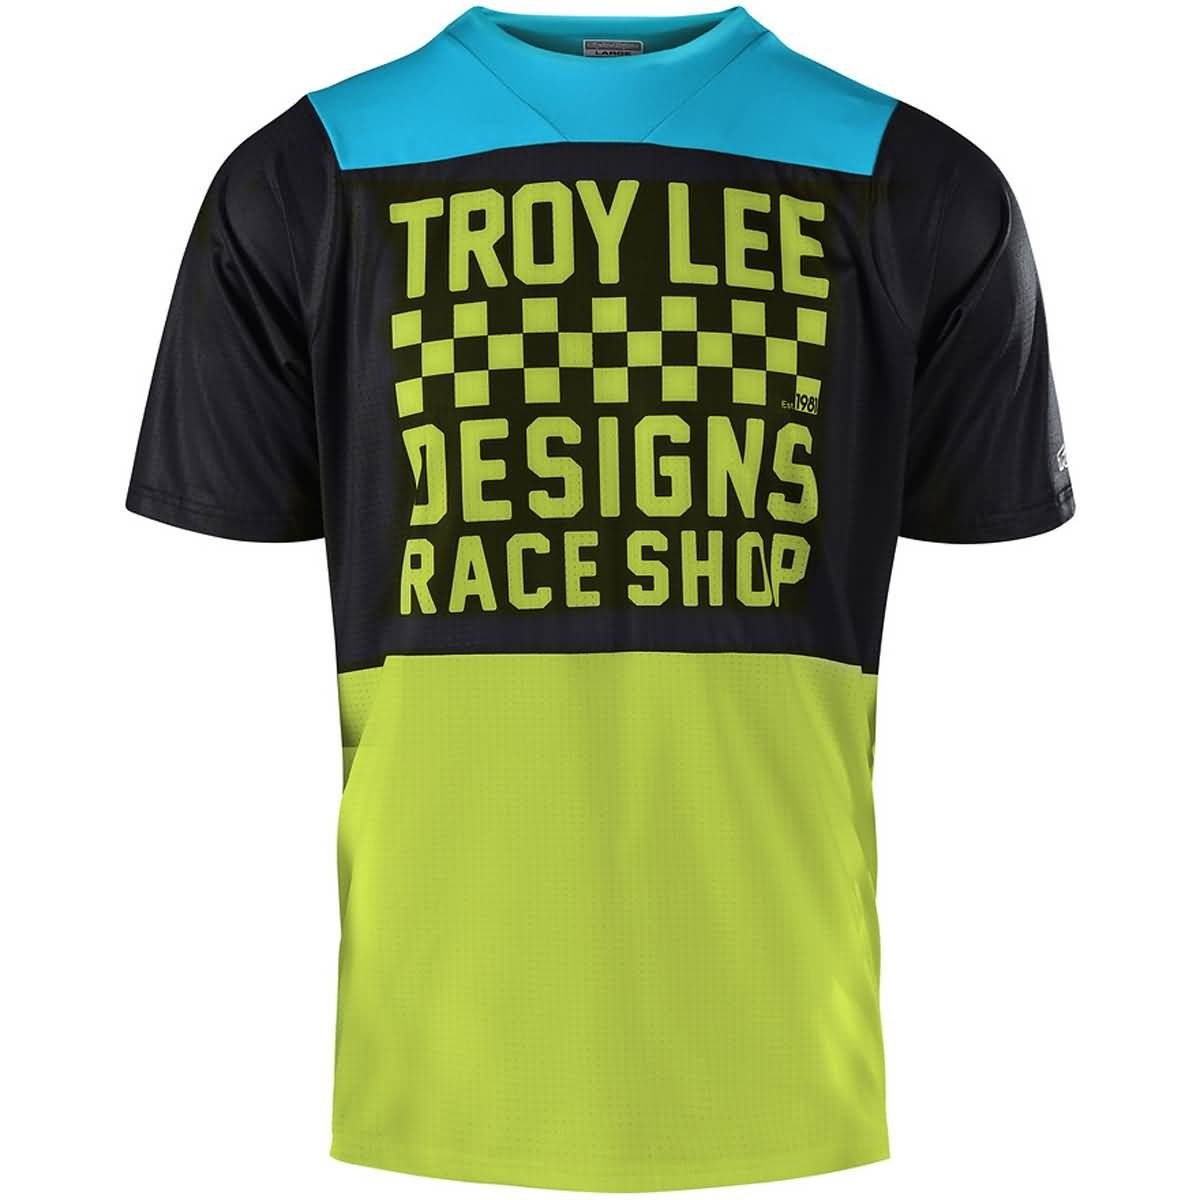 Troy Lee Designs Skyline Jersey - Boys' Checker Black/Lime, S by Troy Lee Designs